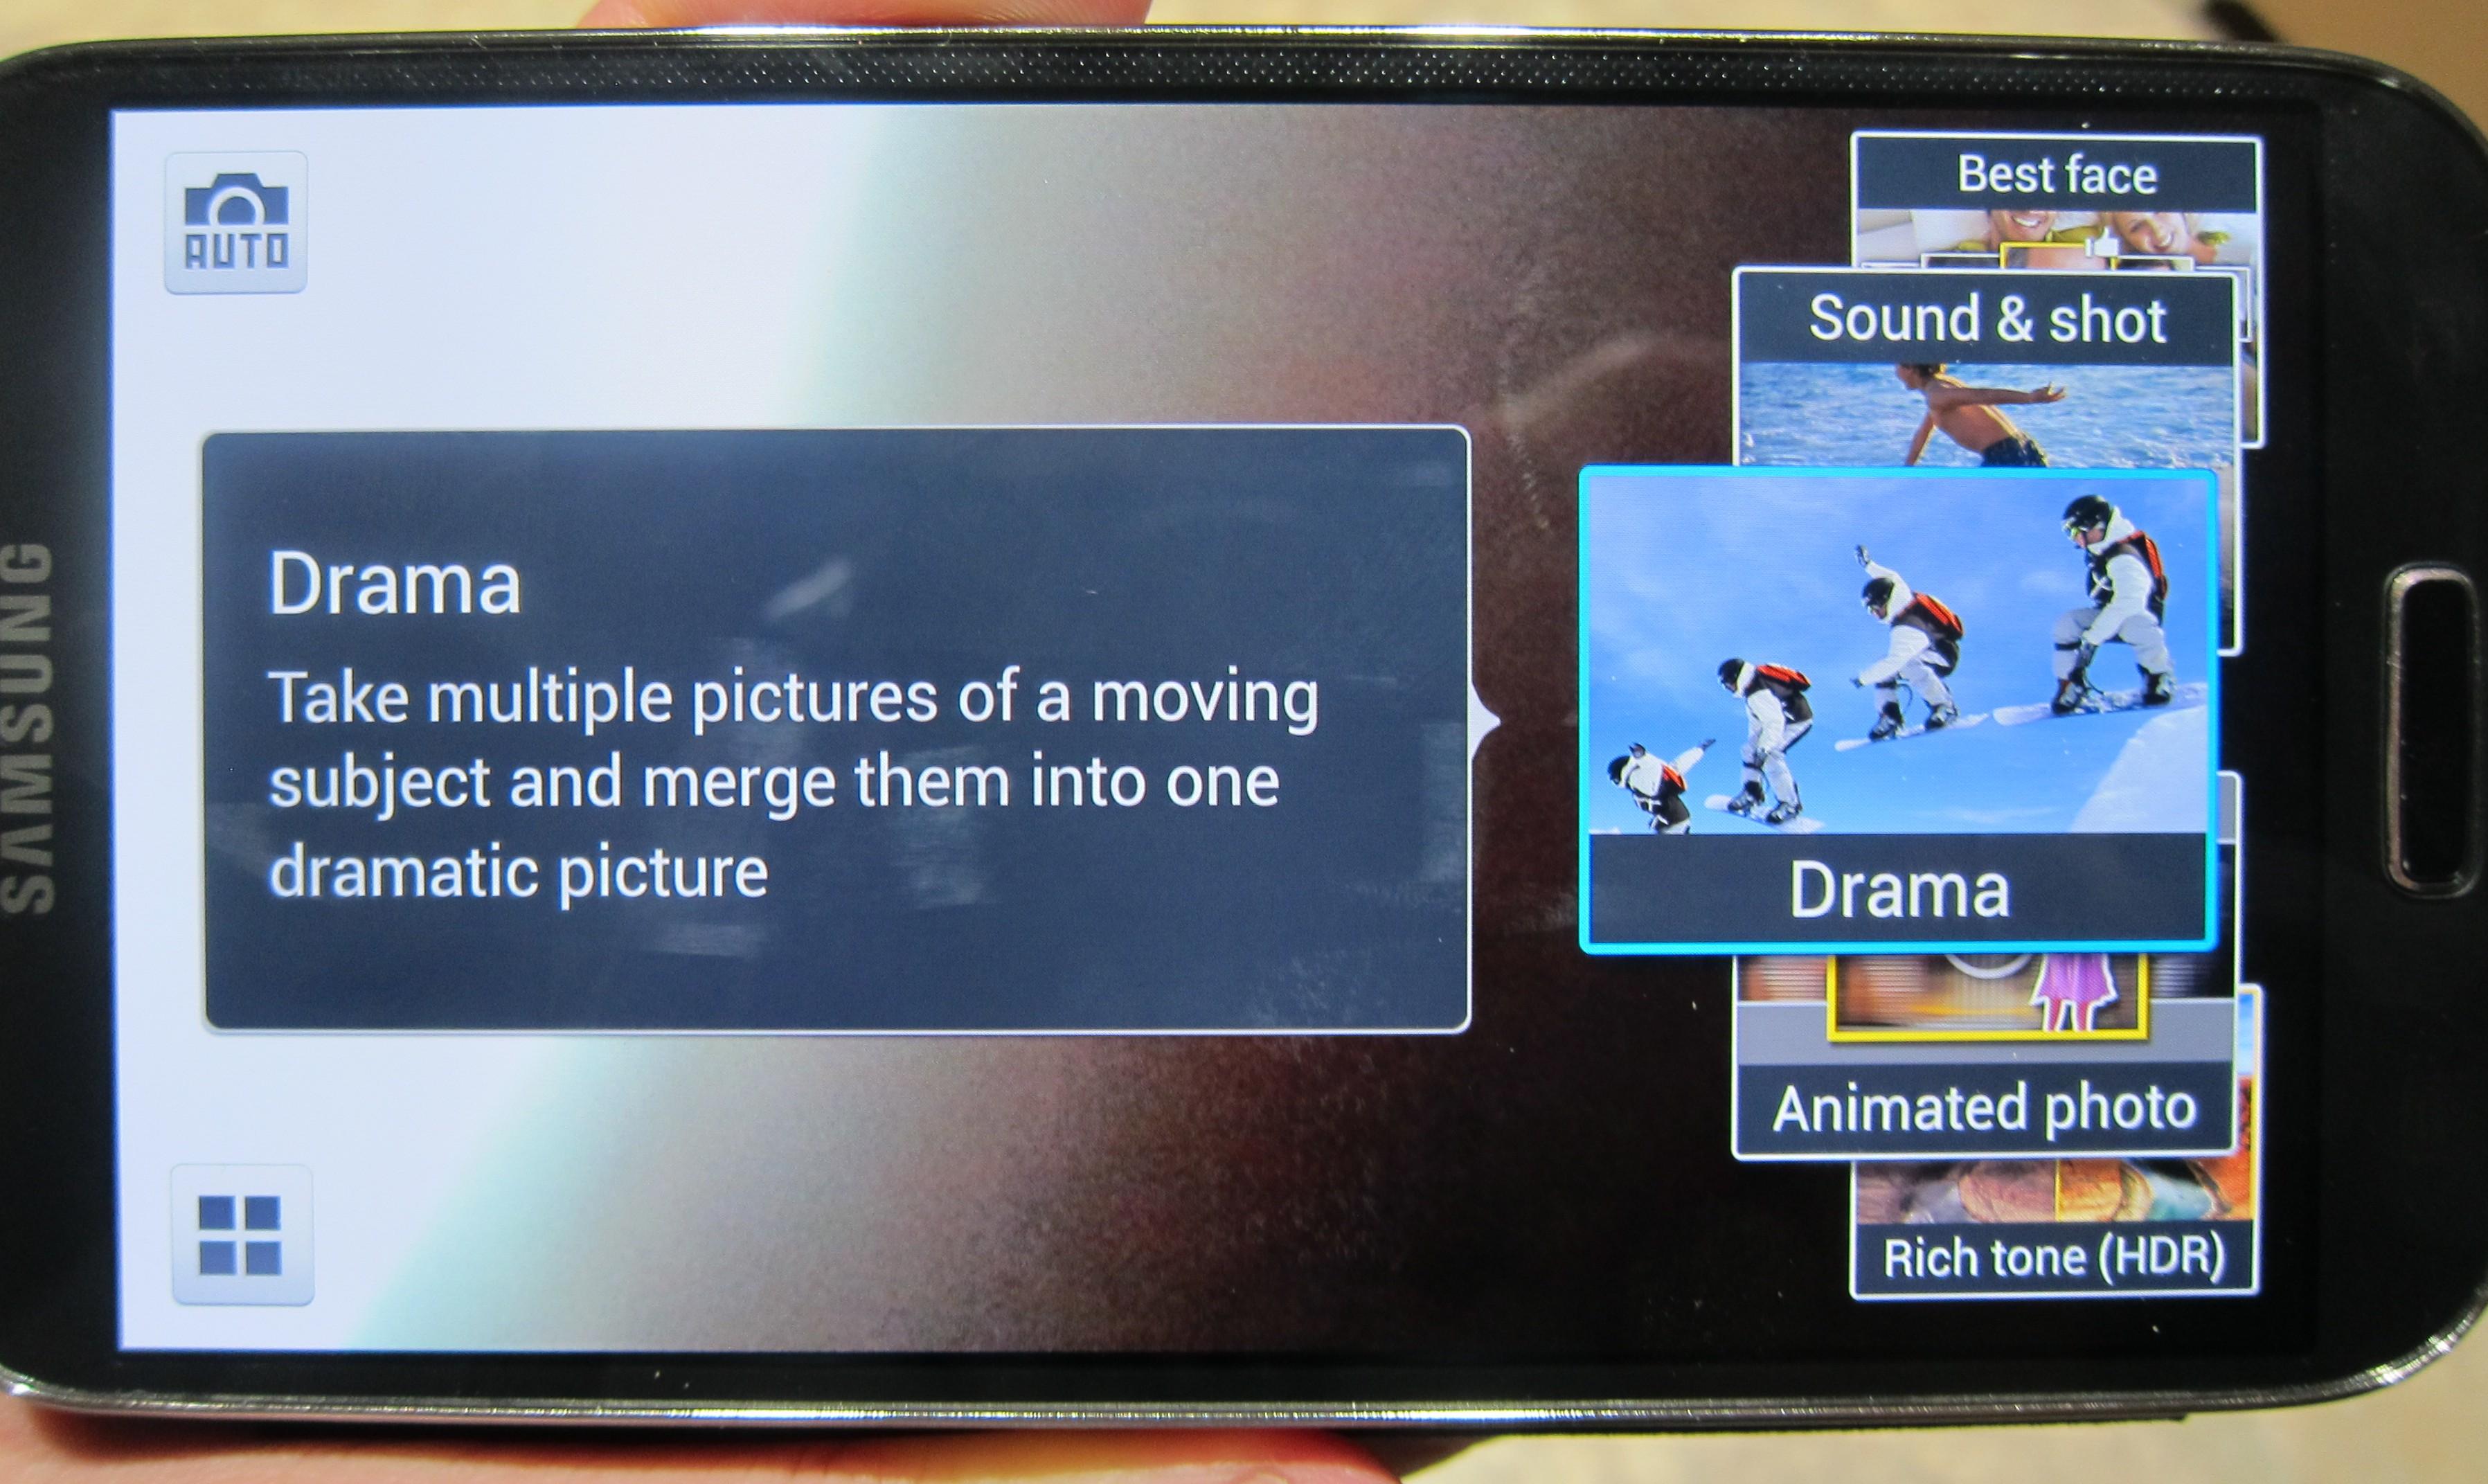 Galaxy S 4 Drama